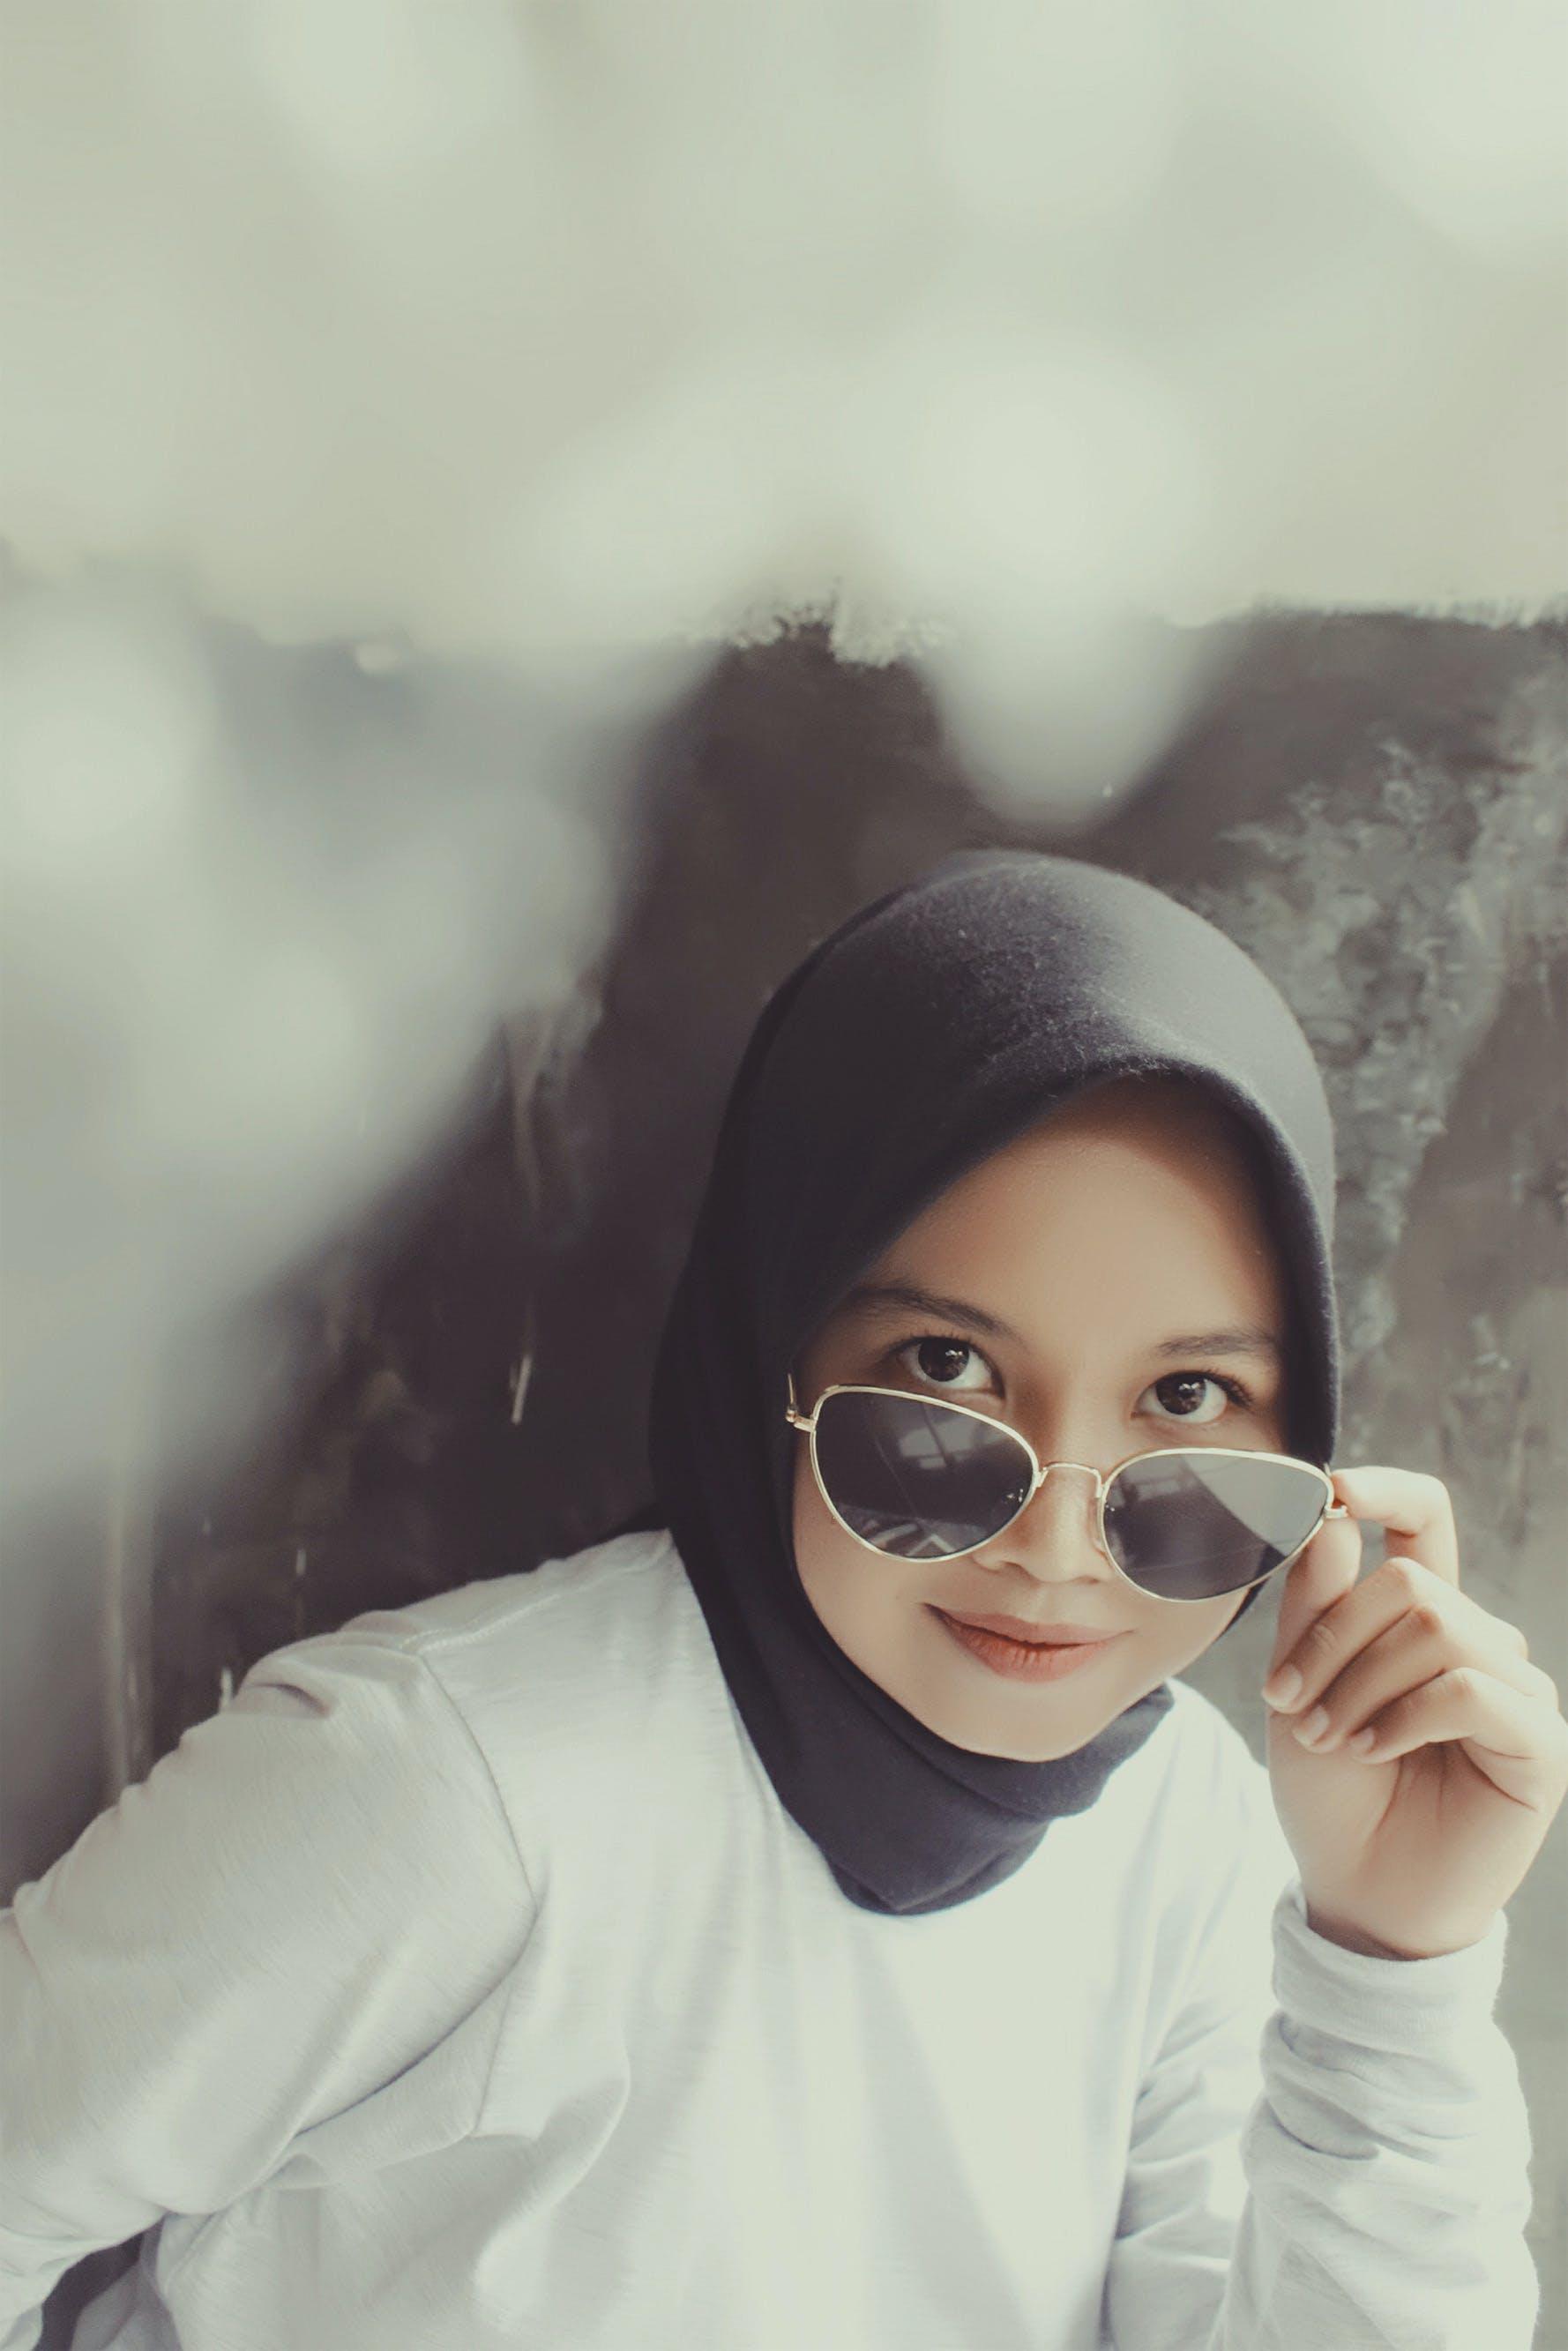 hijab, muçulmano, mulher